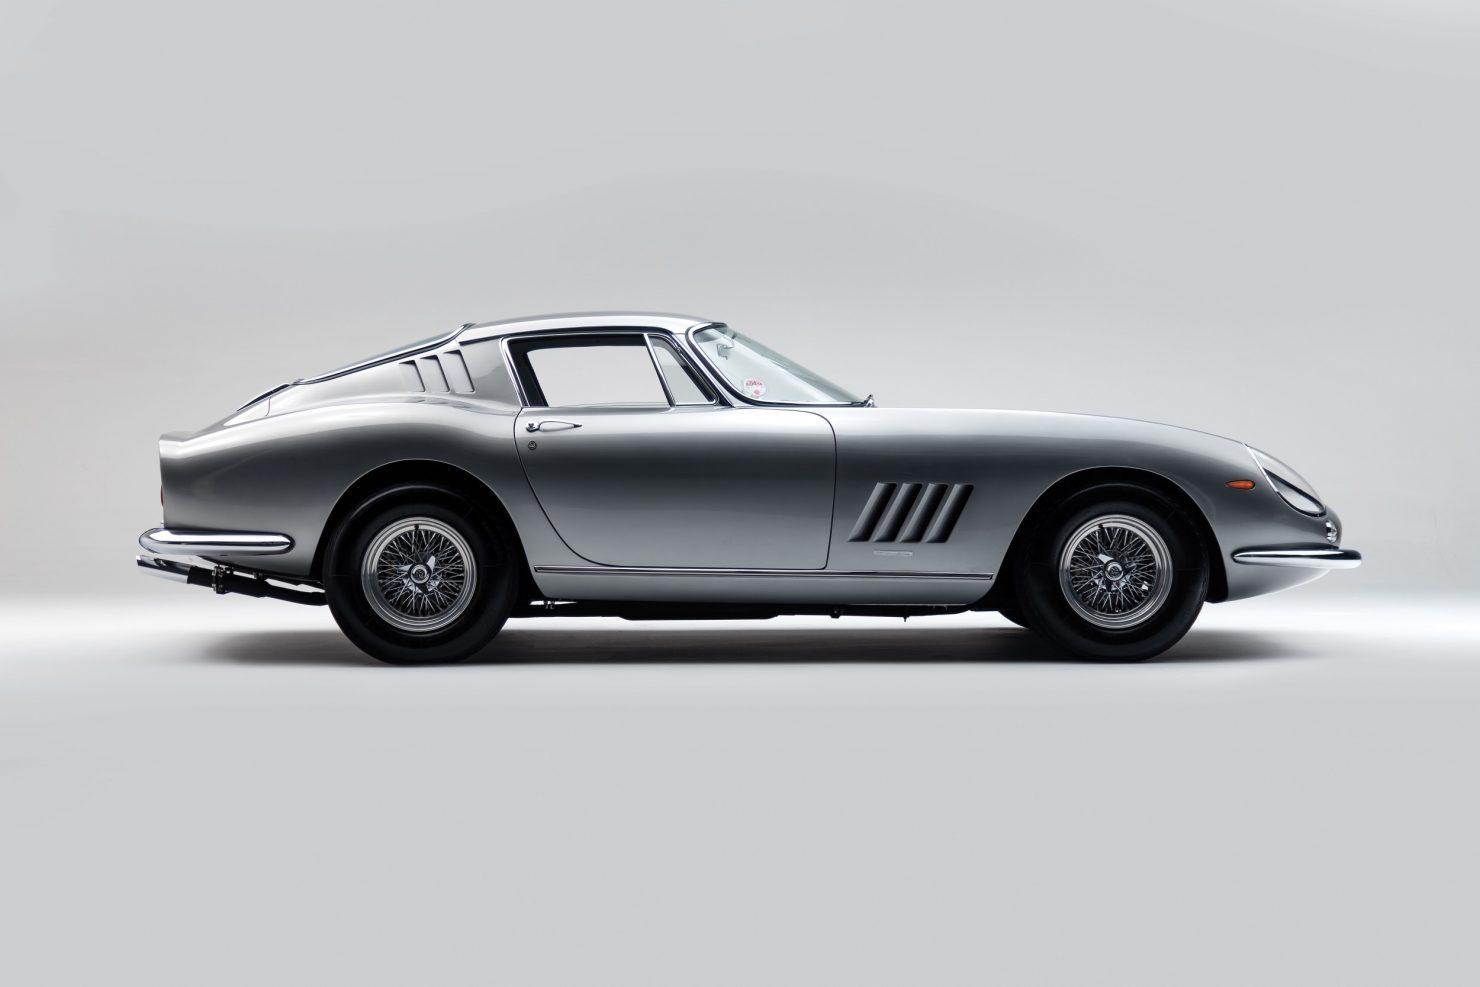 ferrari 275 gtb car 5 1480x987 - 1965 Ferrari 275 GTB/6C Alloy